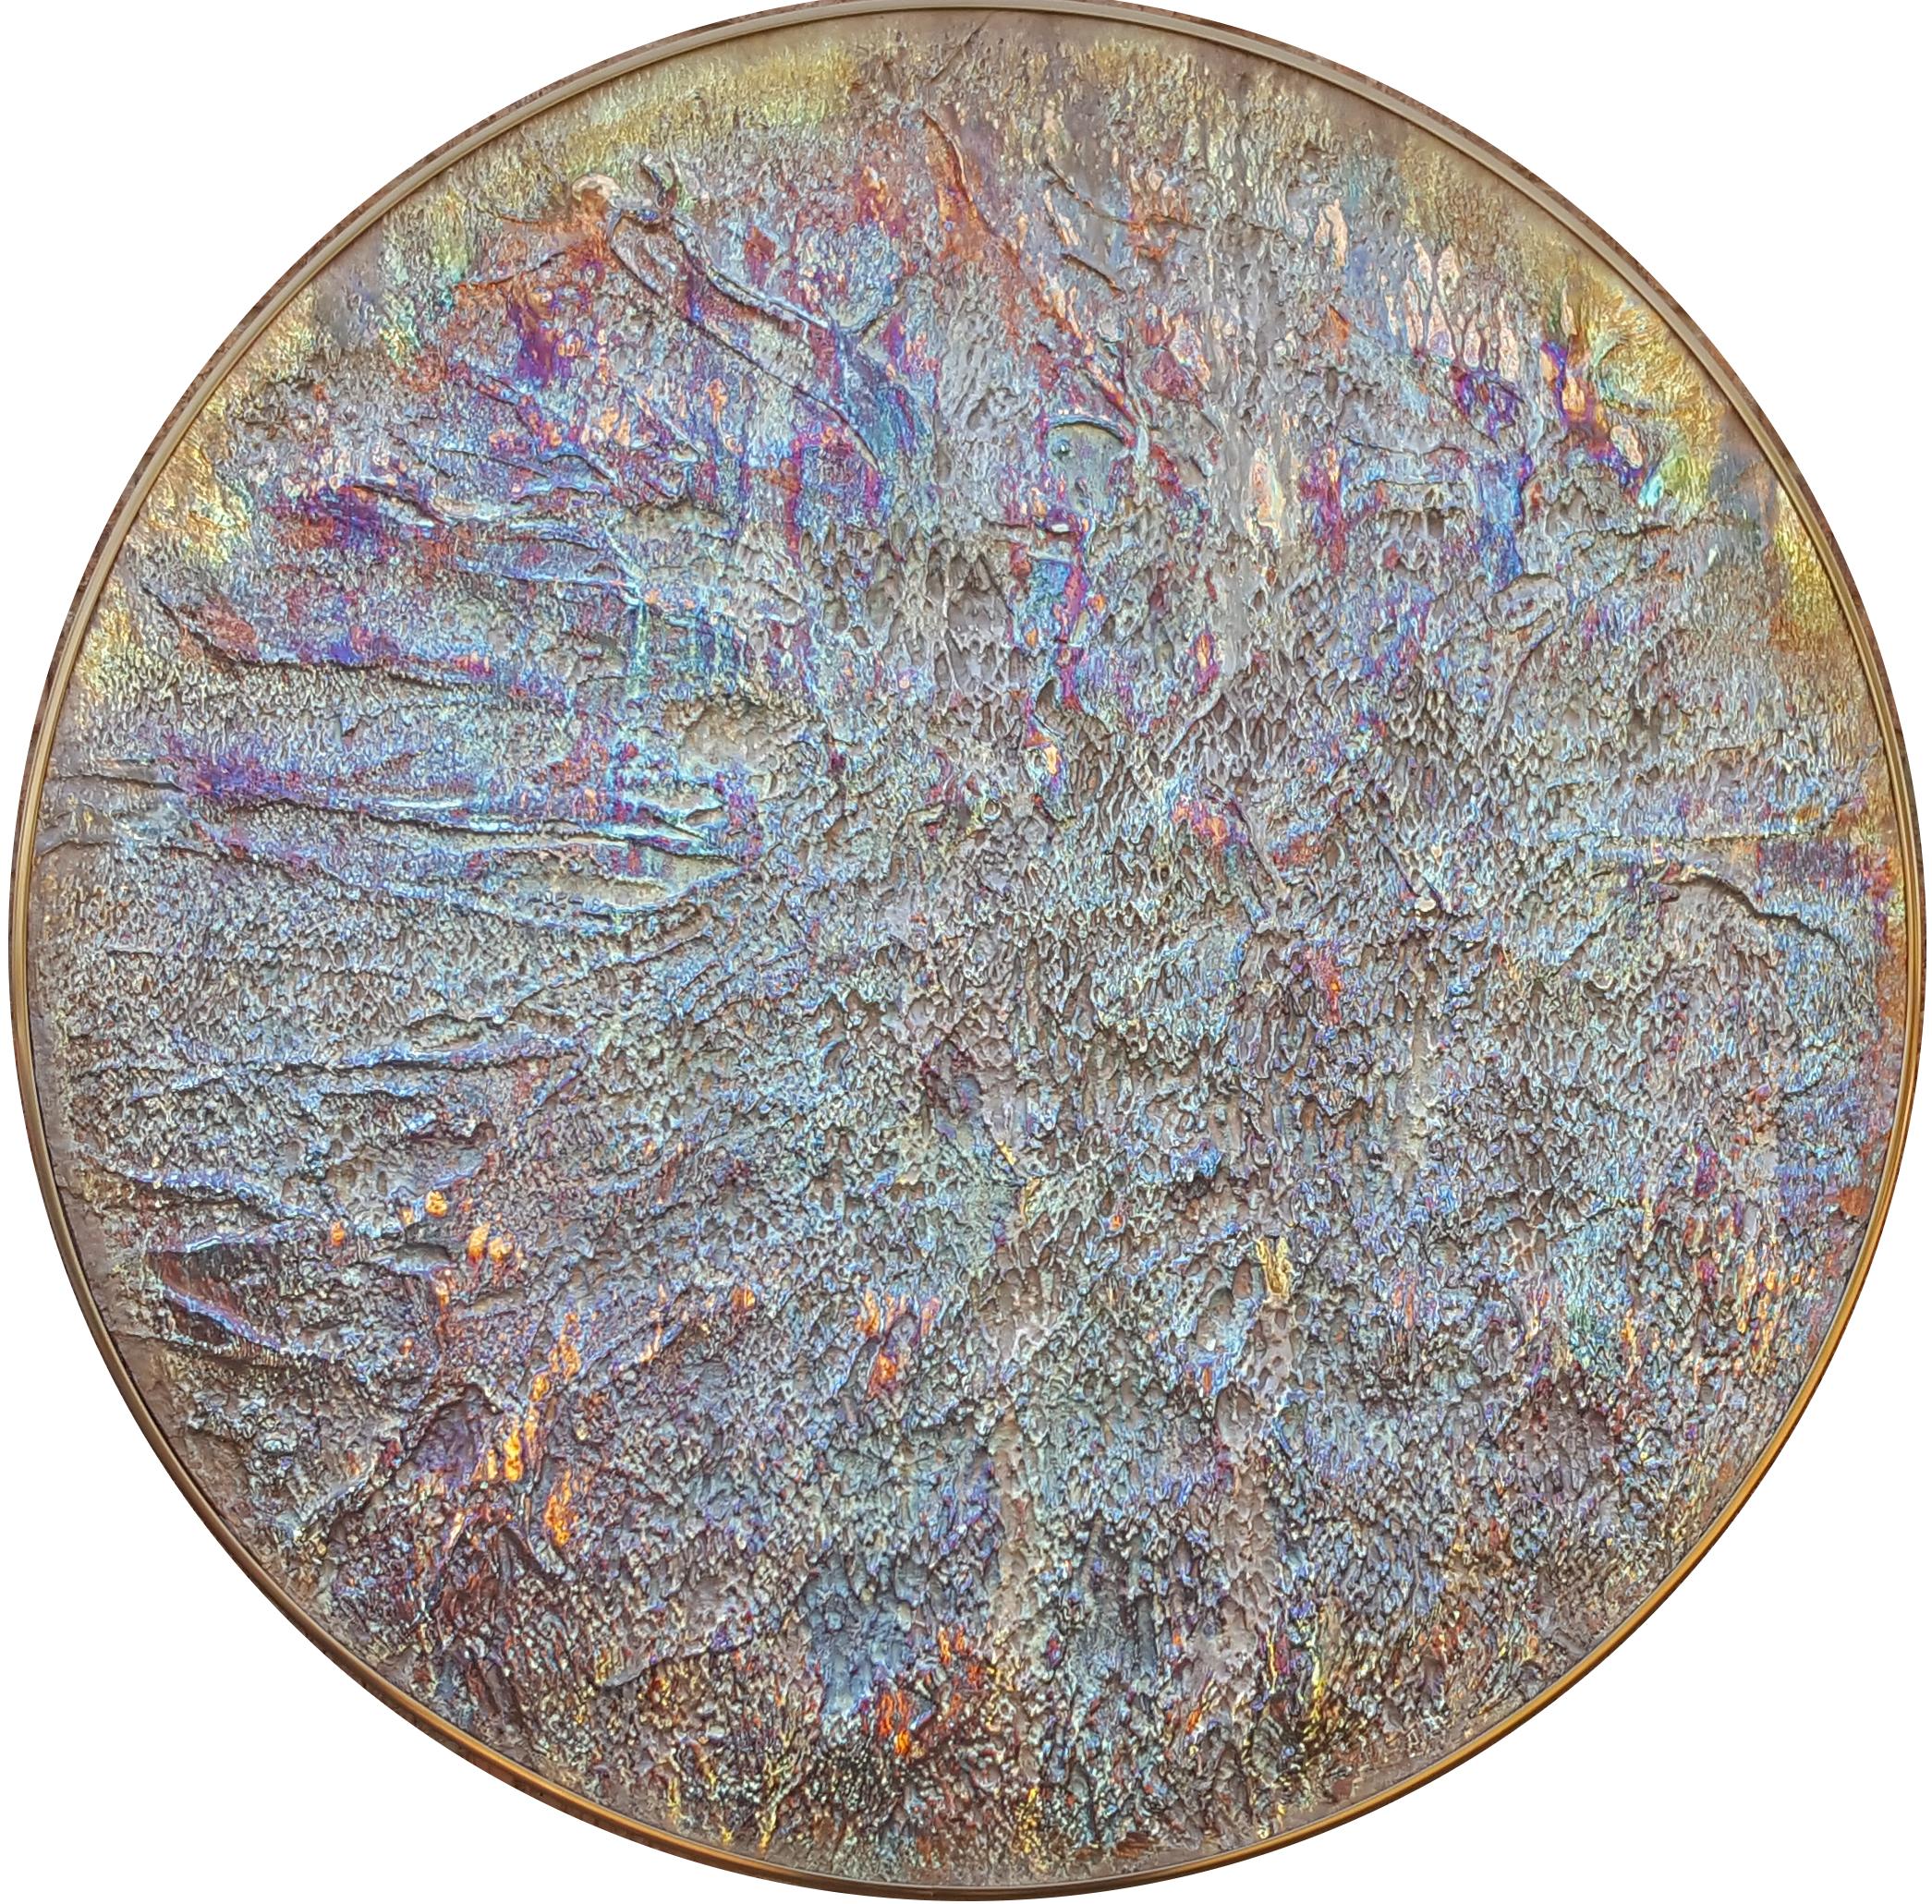 Iridescent Nebula